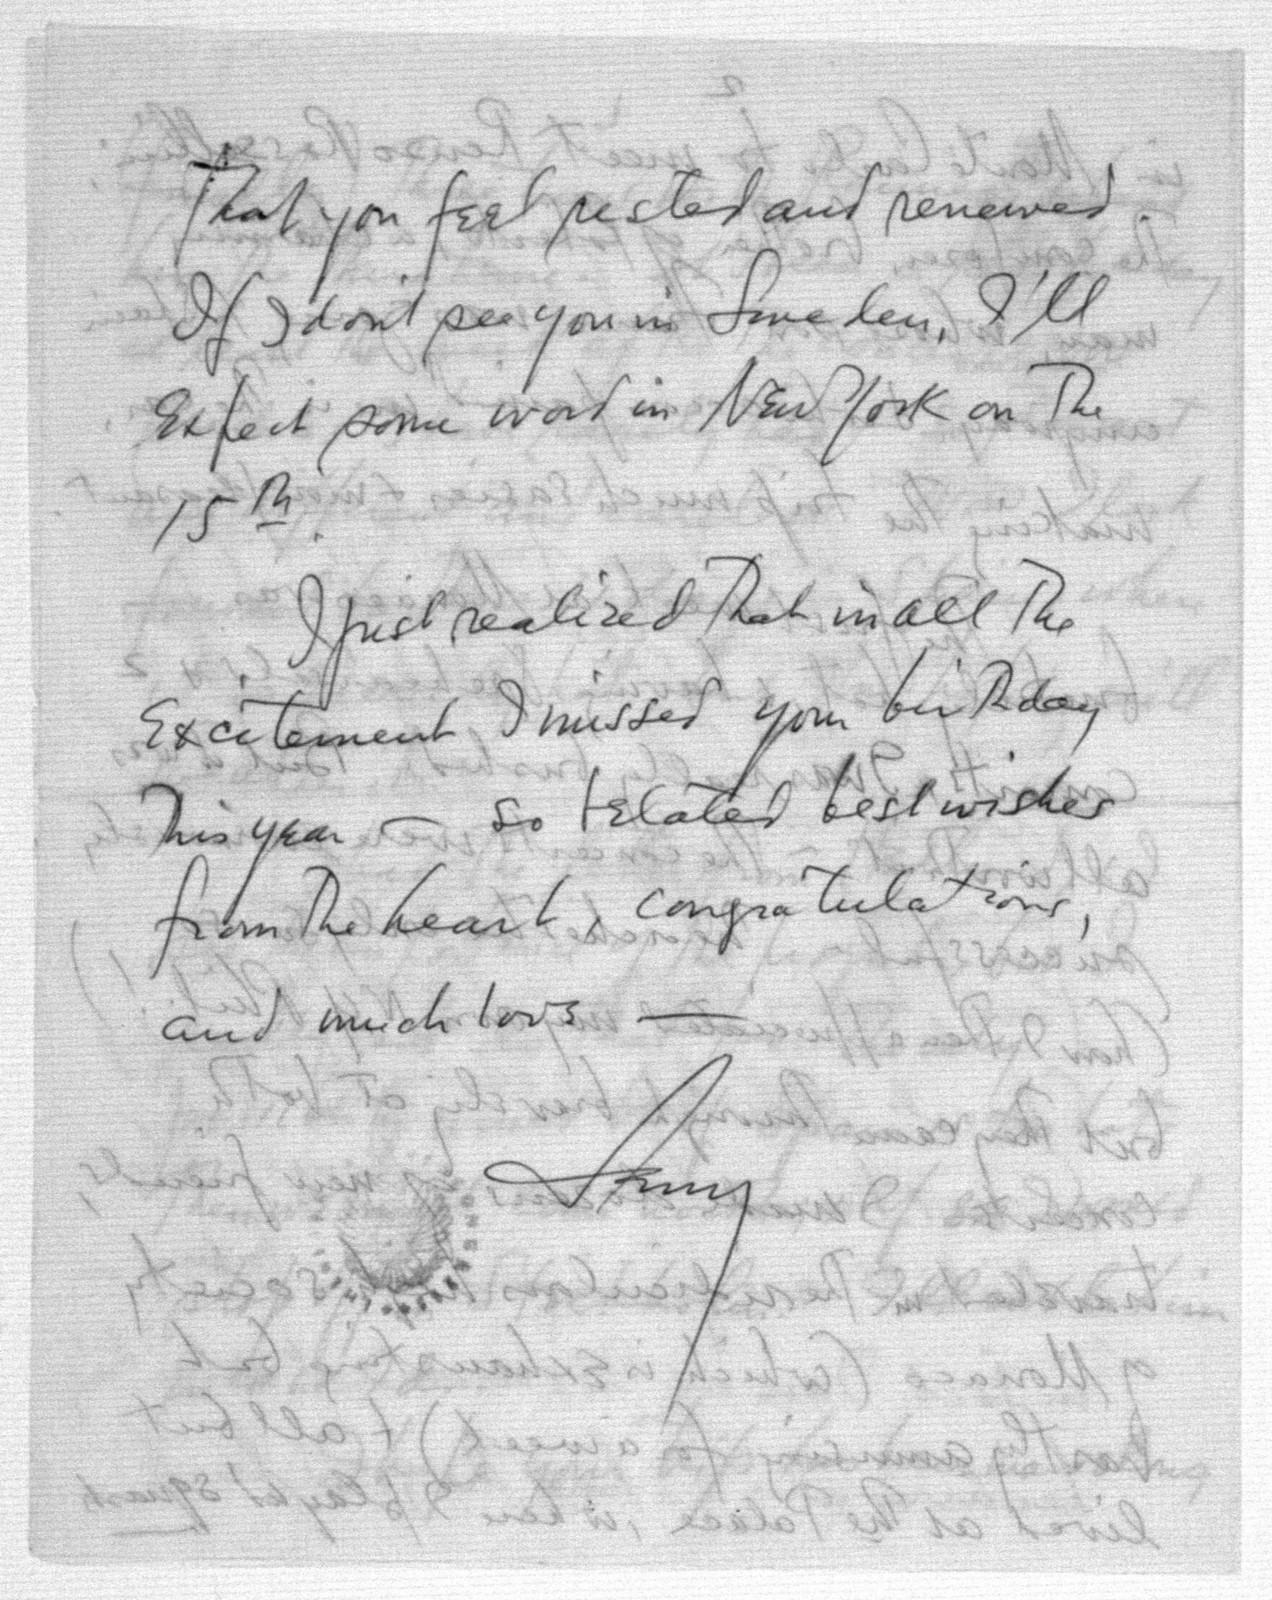 Letter from Leonard Bernstein to Helen Coates, August 3, 1962